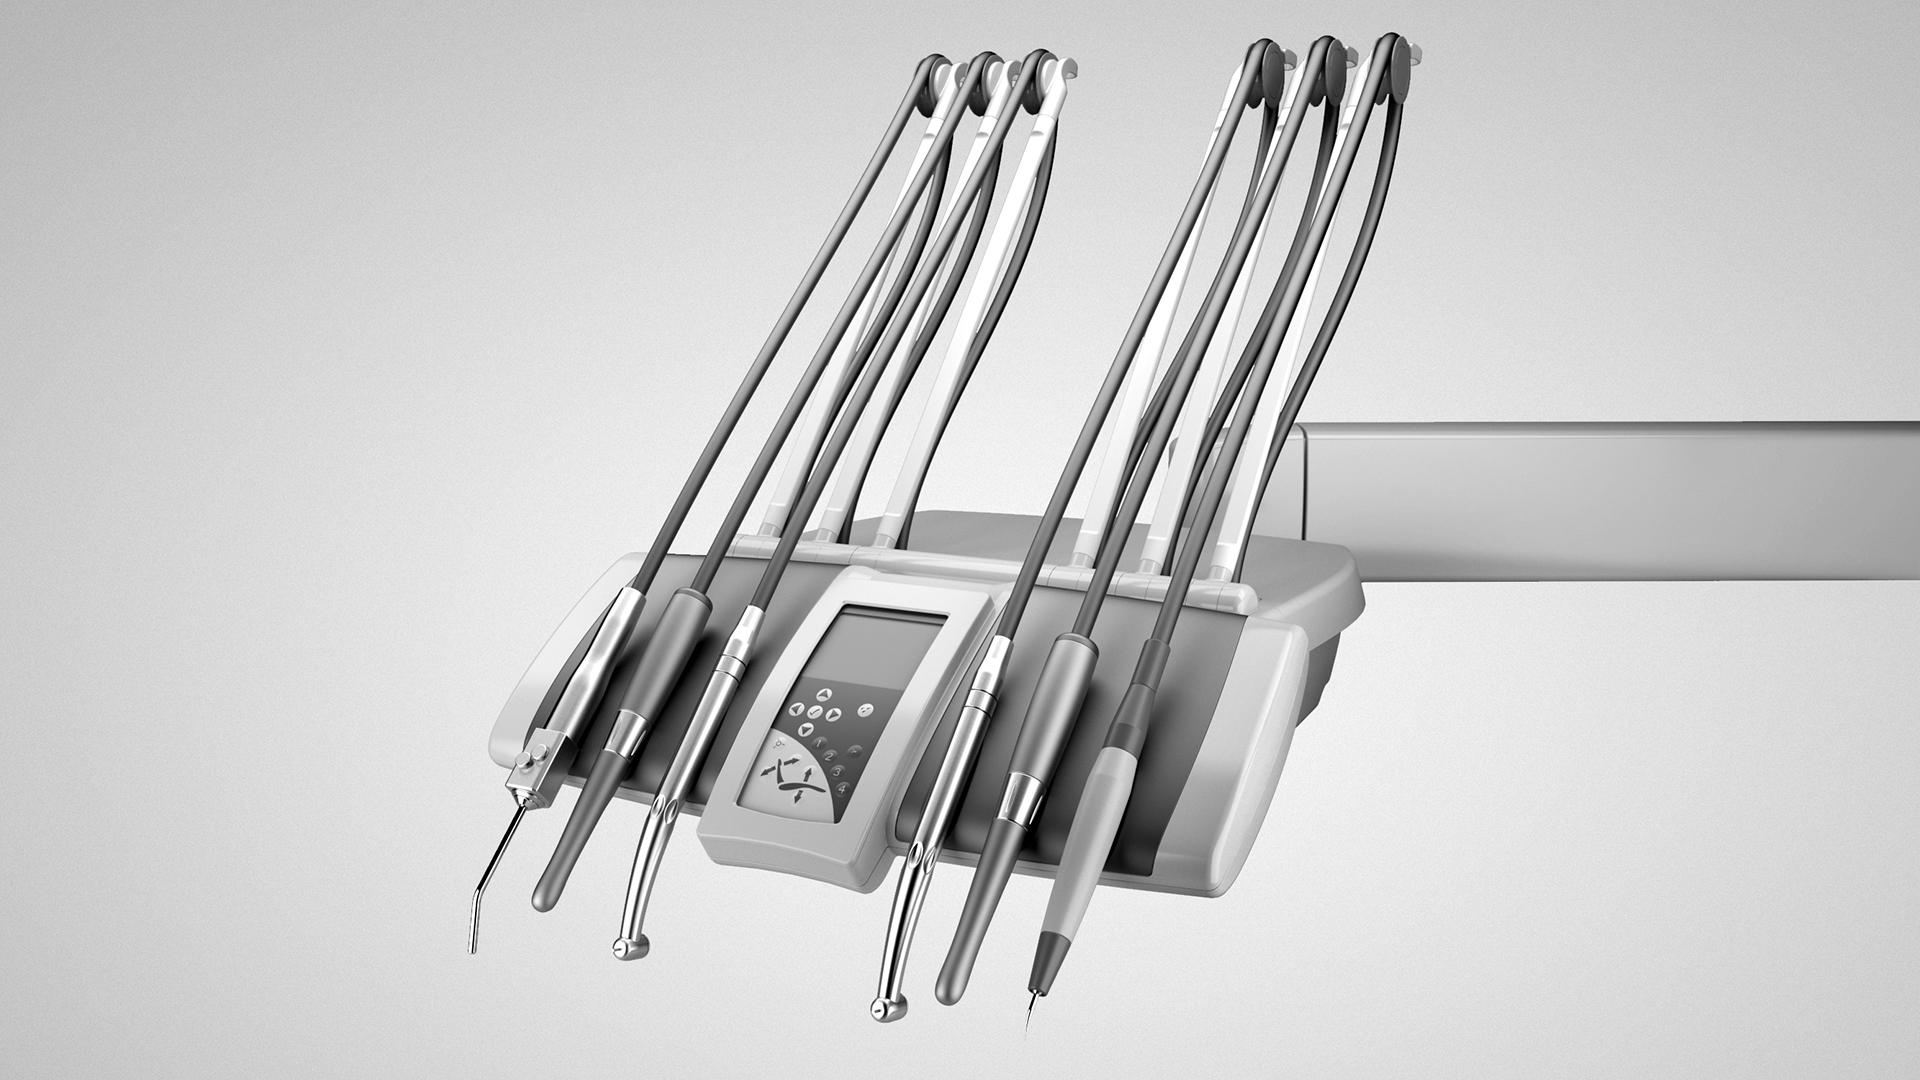 priority_designs_midmark_dental_equipment_design_engineering_prototyping_008